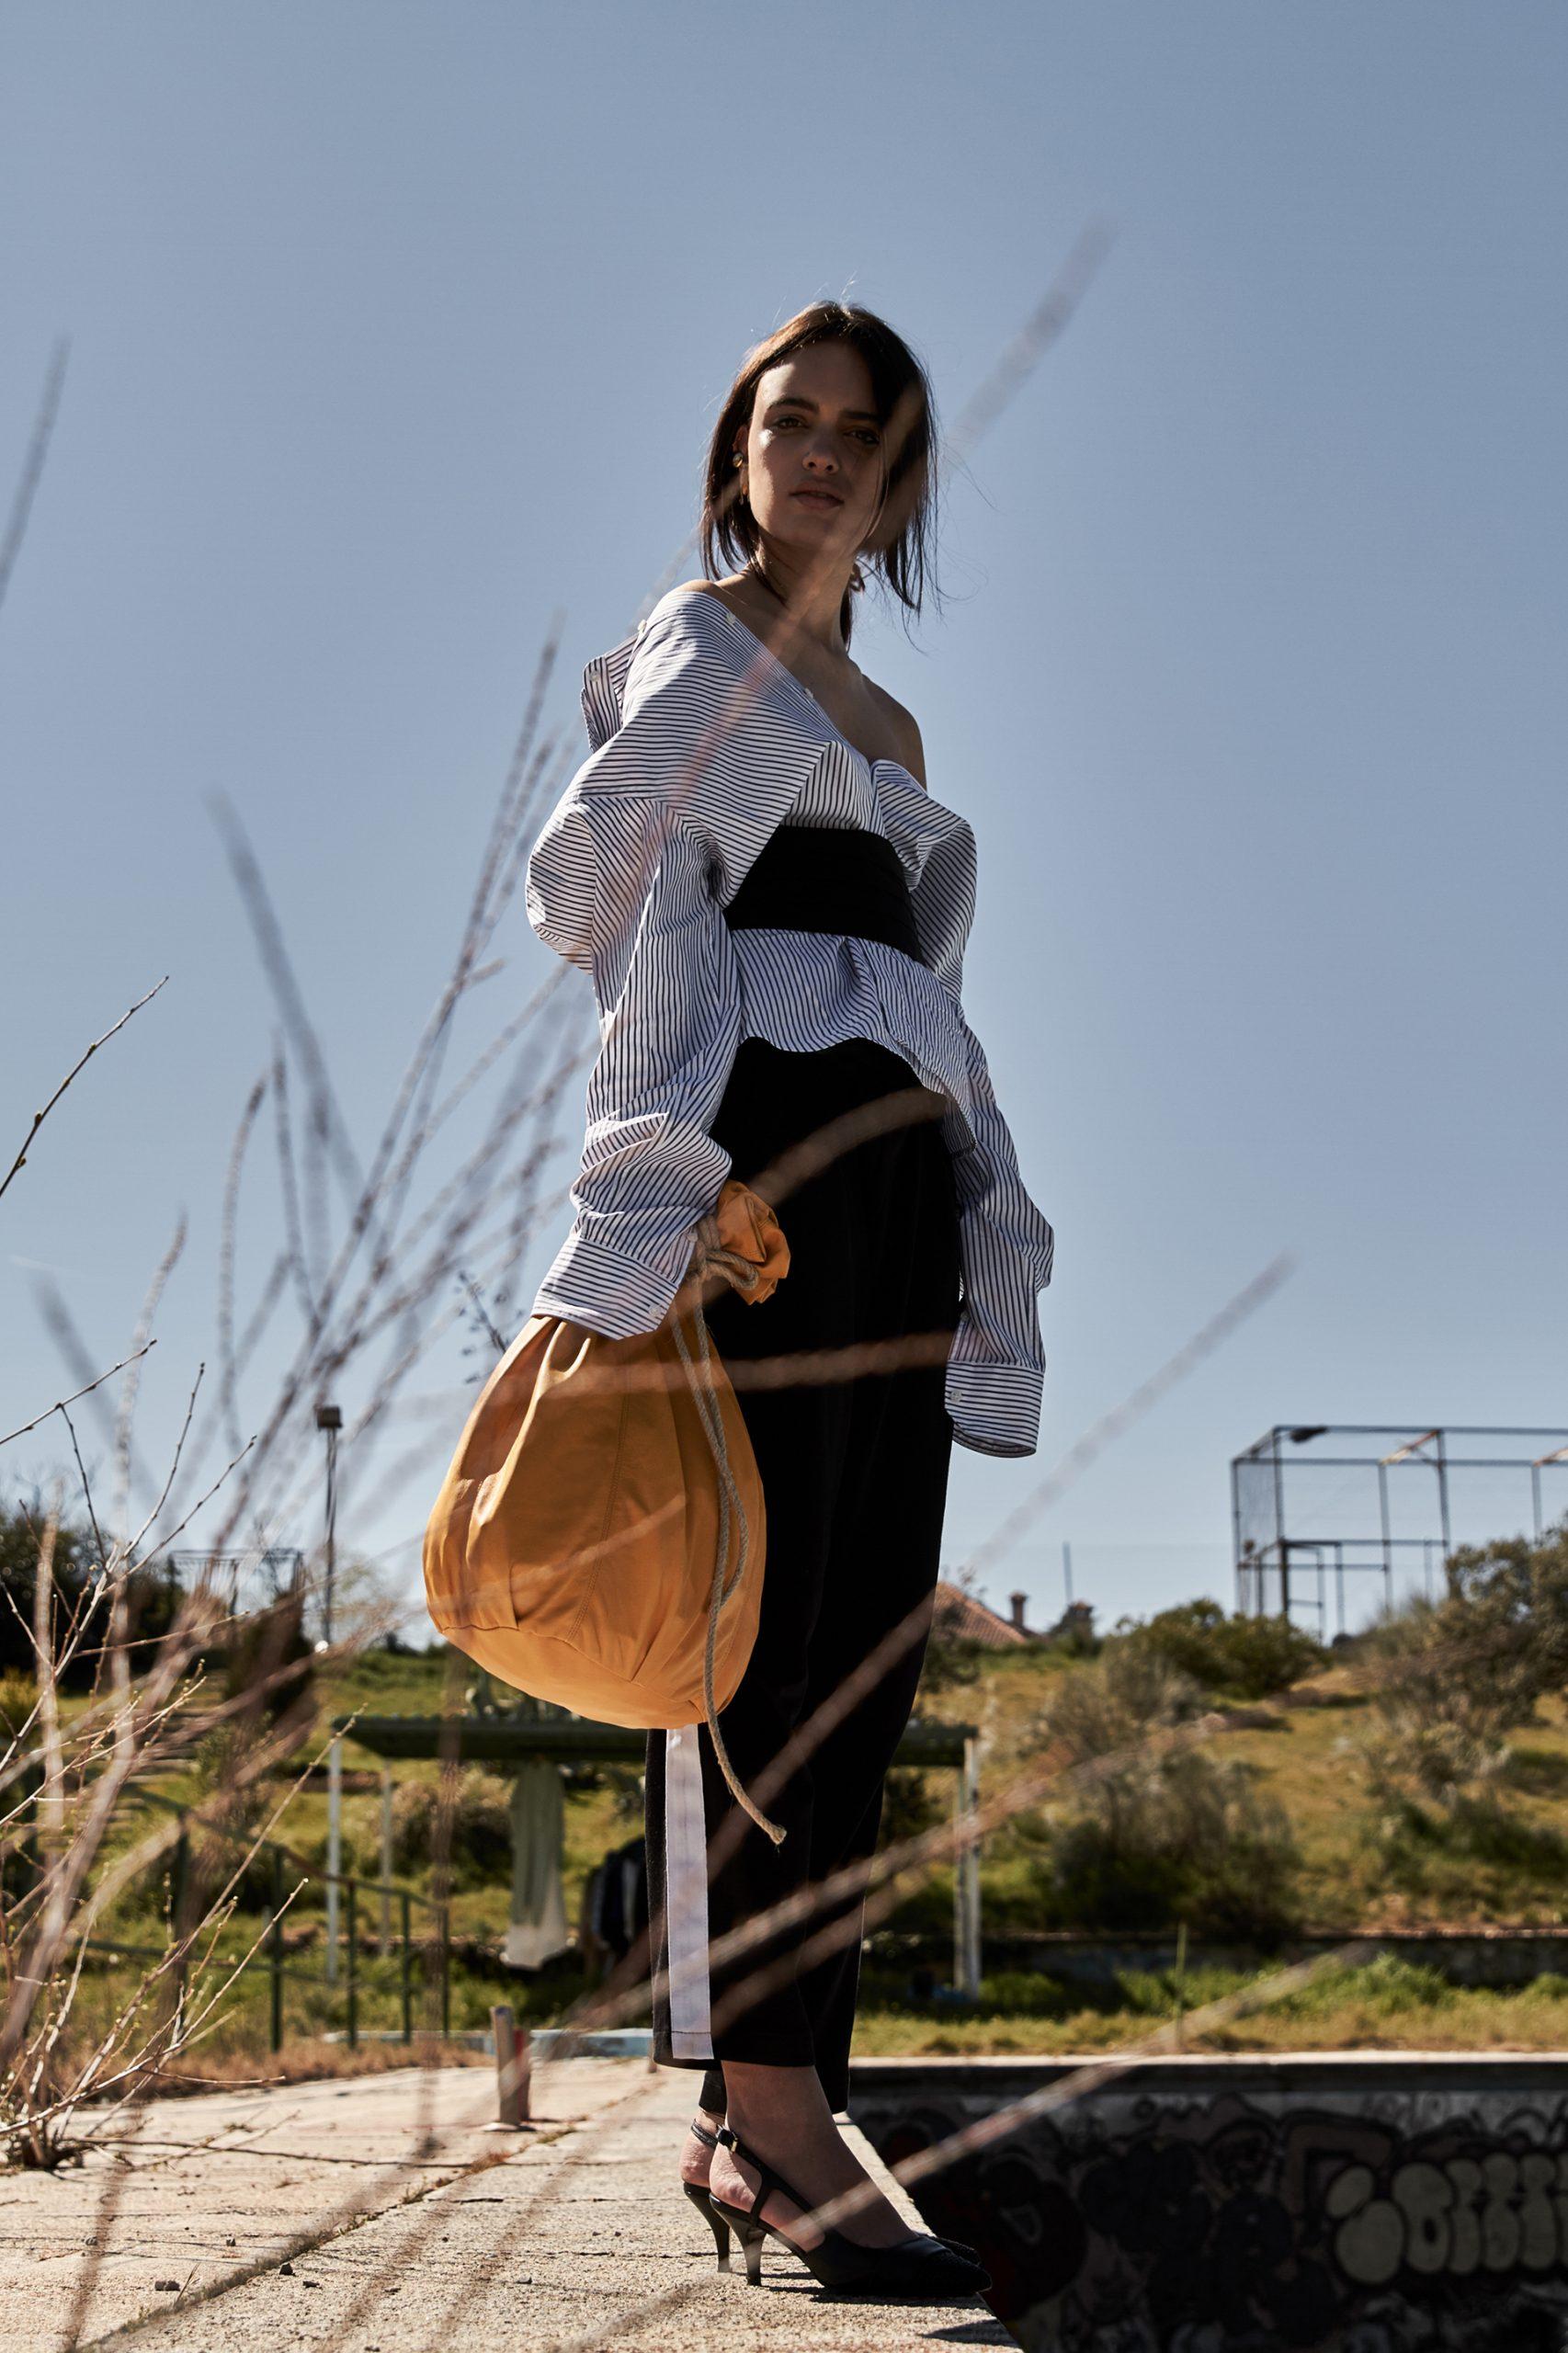 editoriale moda, street style, fashion editorial, the fashion atlas, broad shoulders, Maria Sague Esquivias,